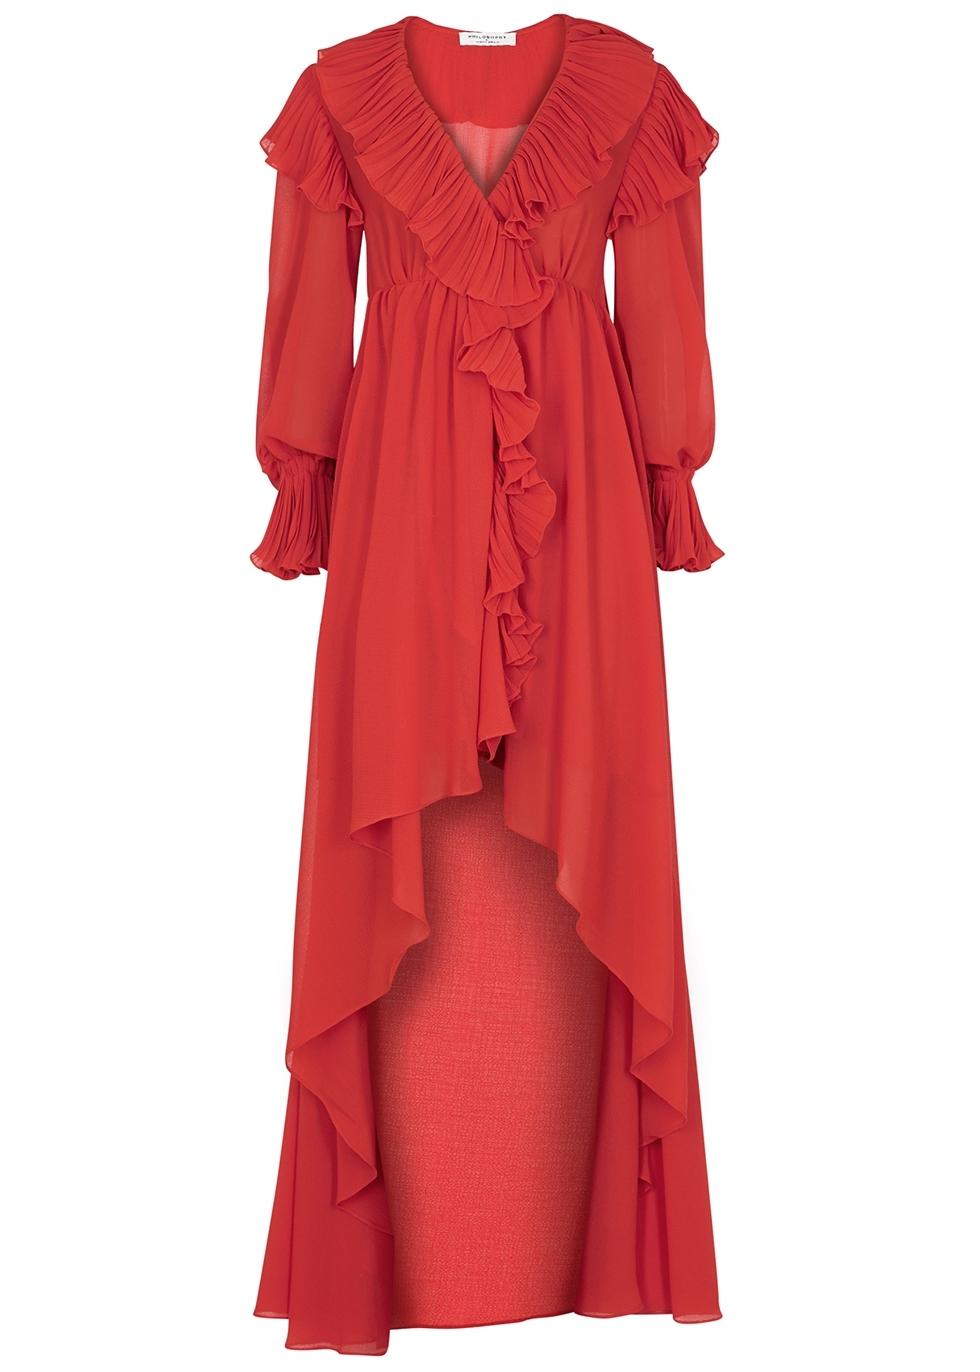 a5793bb079bc Designer Dresses   Designer Gowns - Harvey Nichols